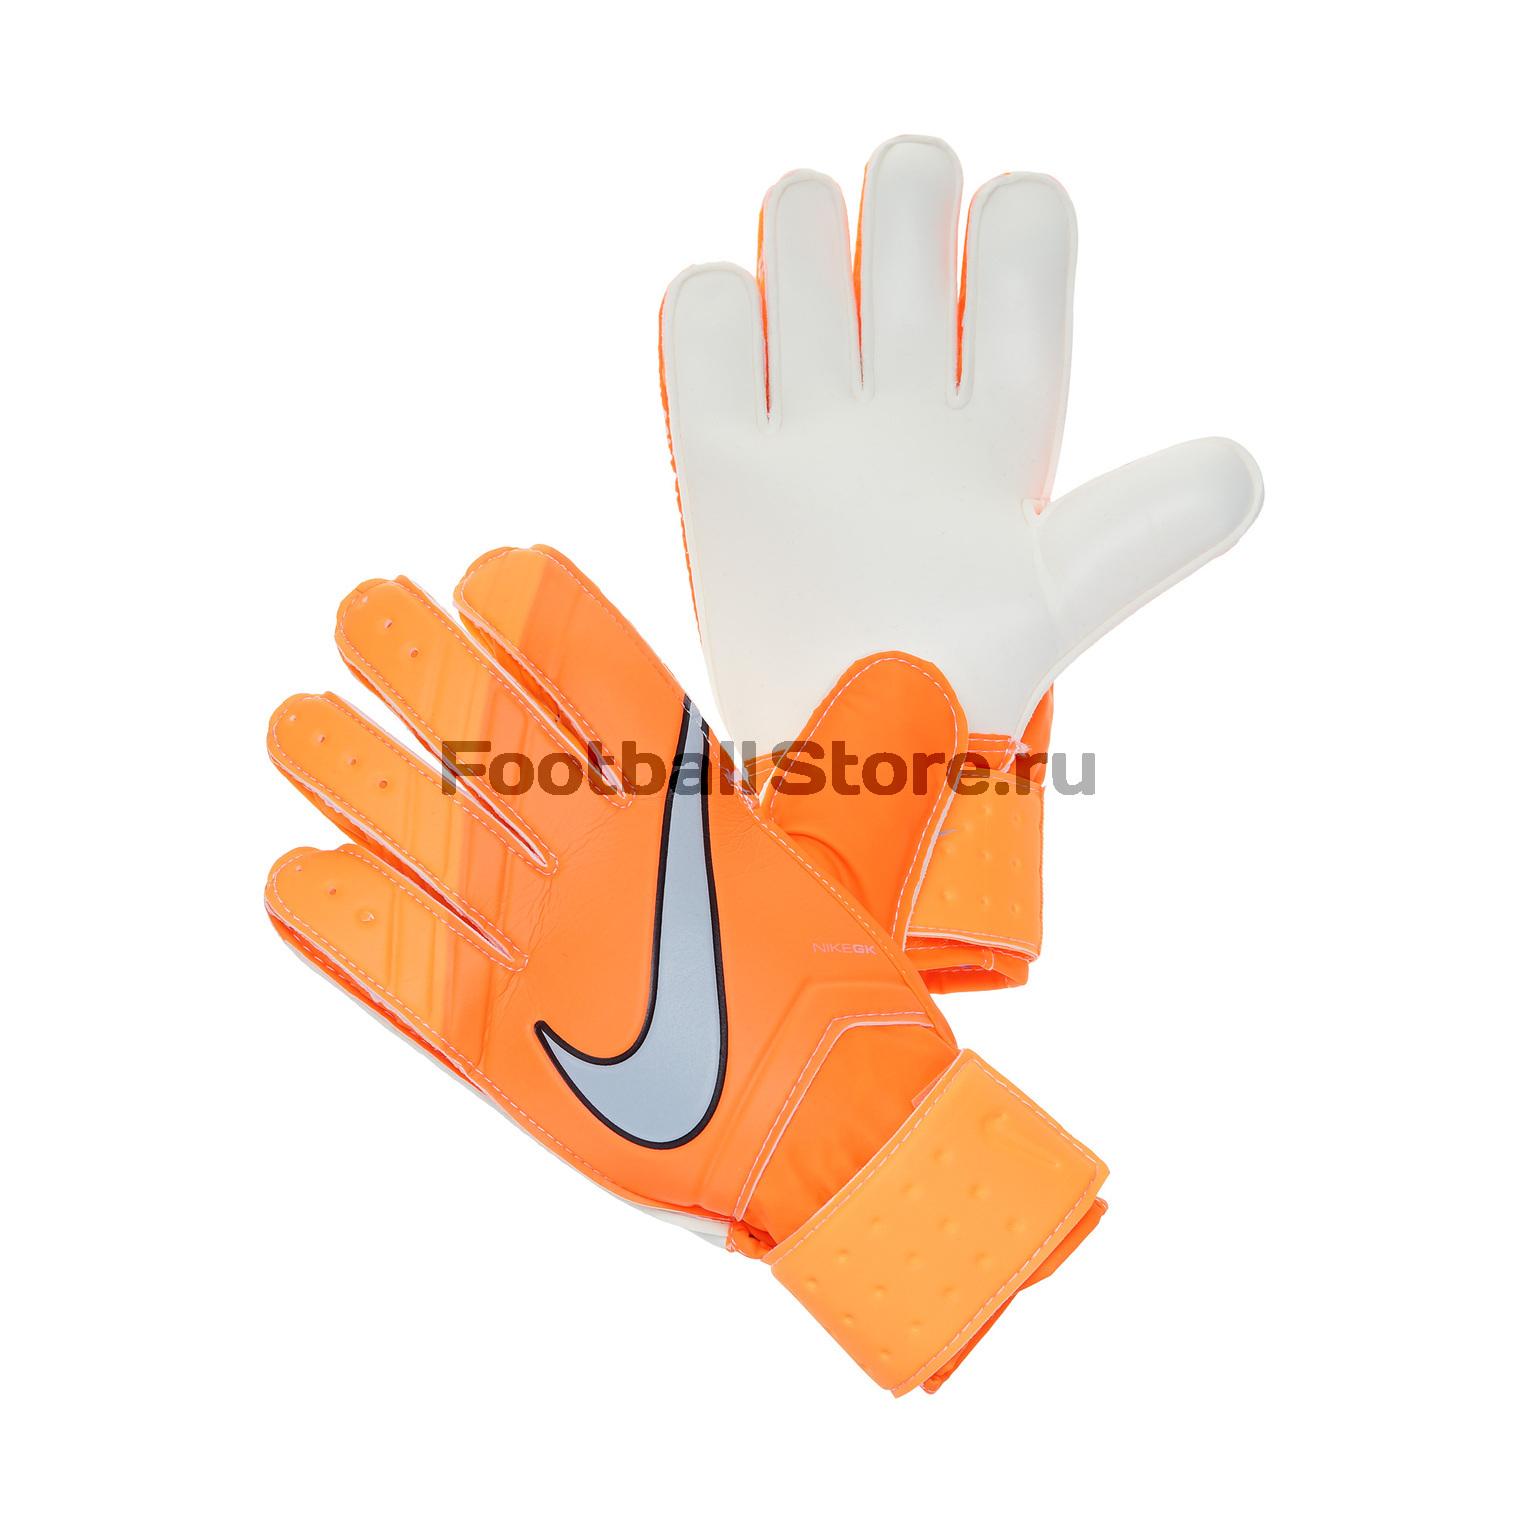 Перчатки вратарские Nike GK Match GS0282-803 curt richter – a life in the laboratory